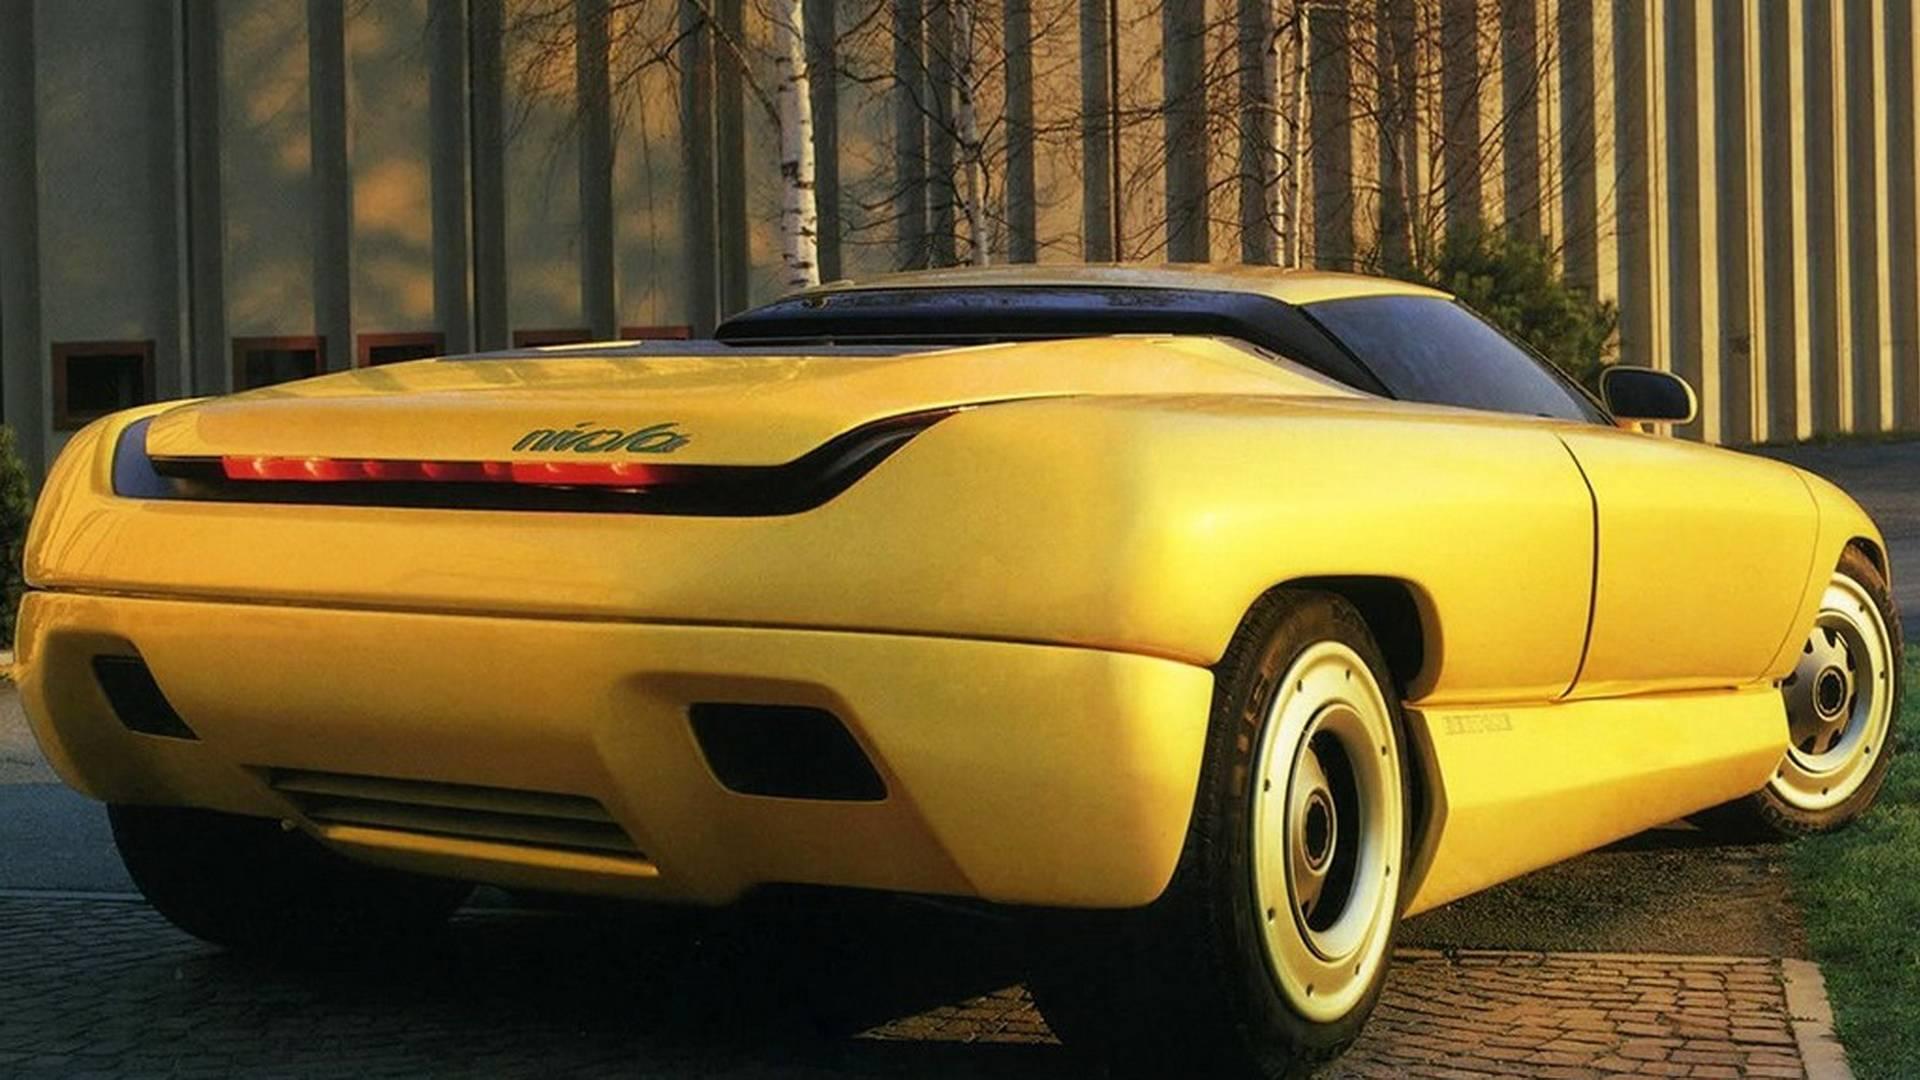 1990 Bertone Nivola concept 3/4 rear passenger